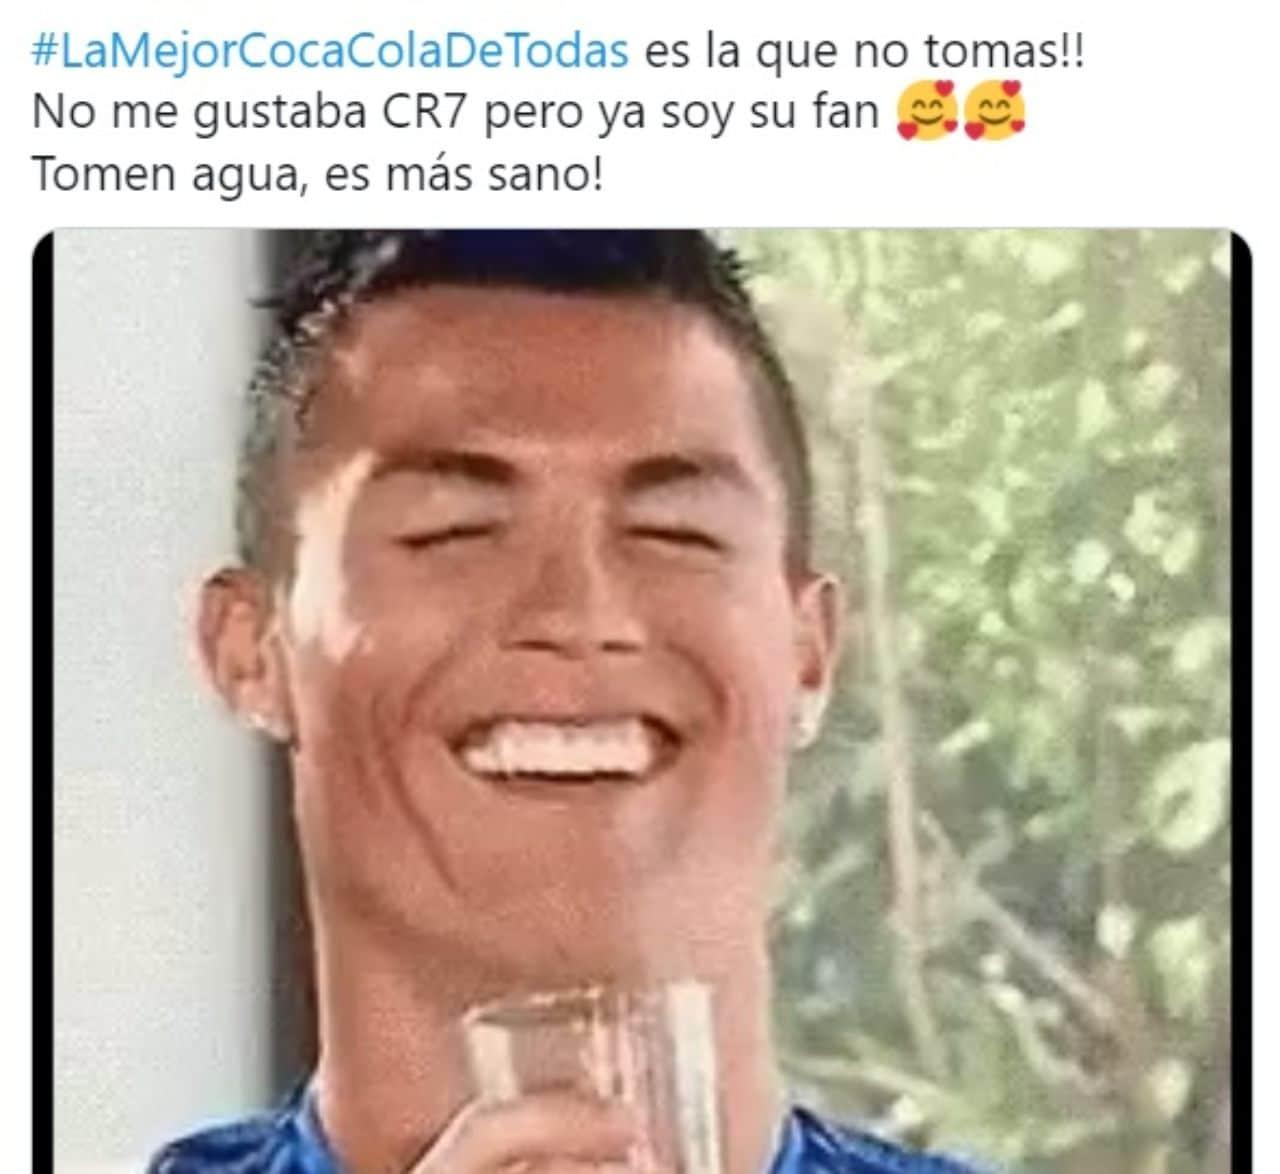 Cristiano Ronaldo tomando agua meme